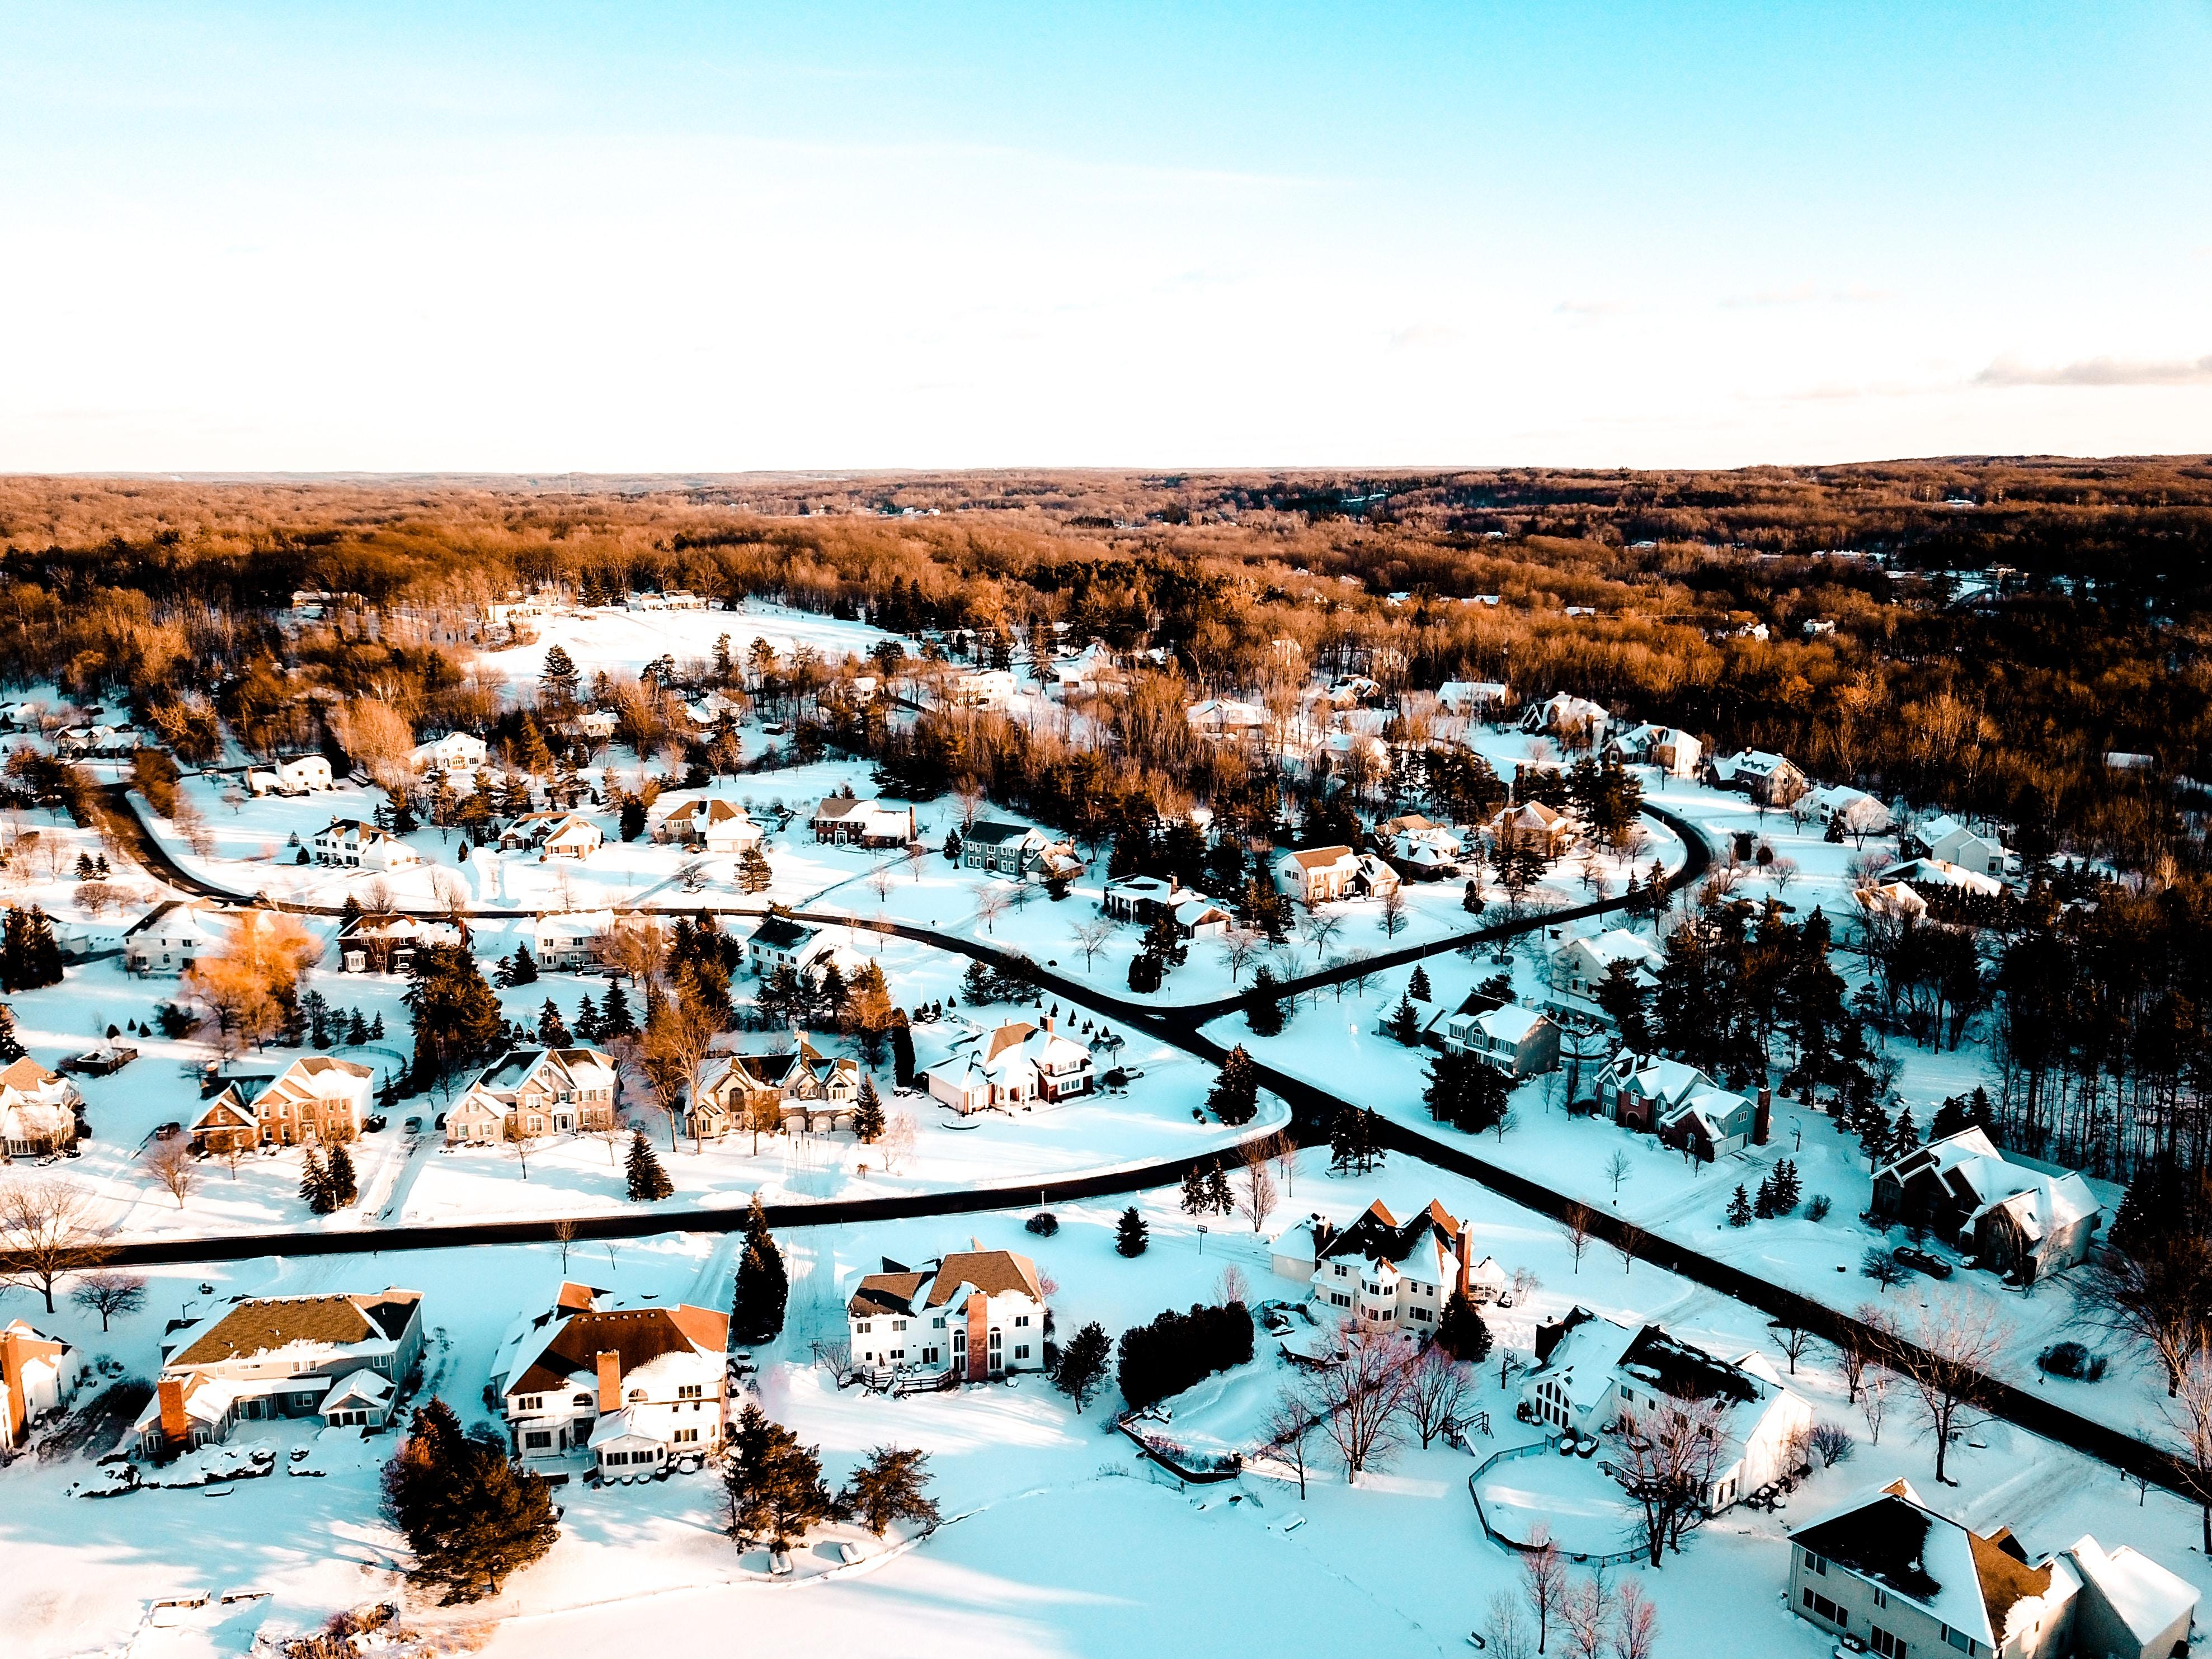 snow coated village